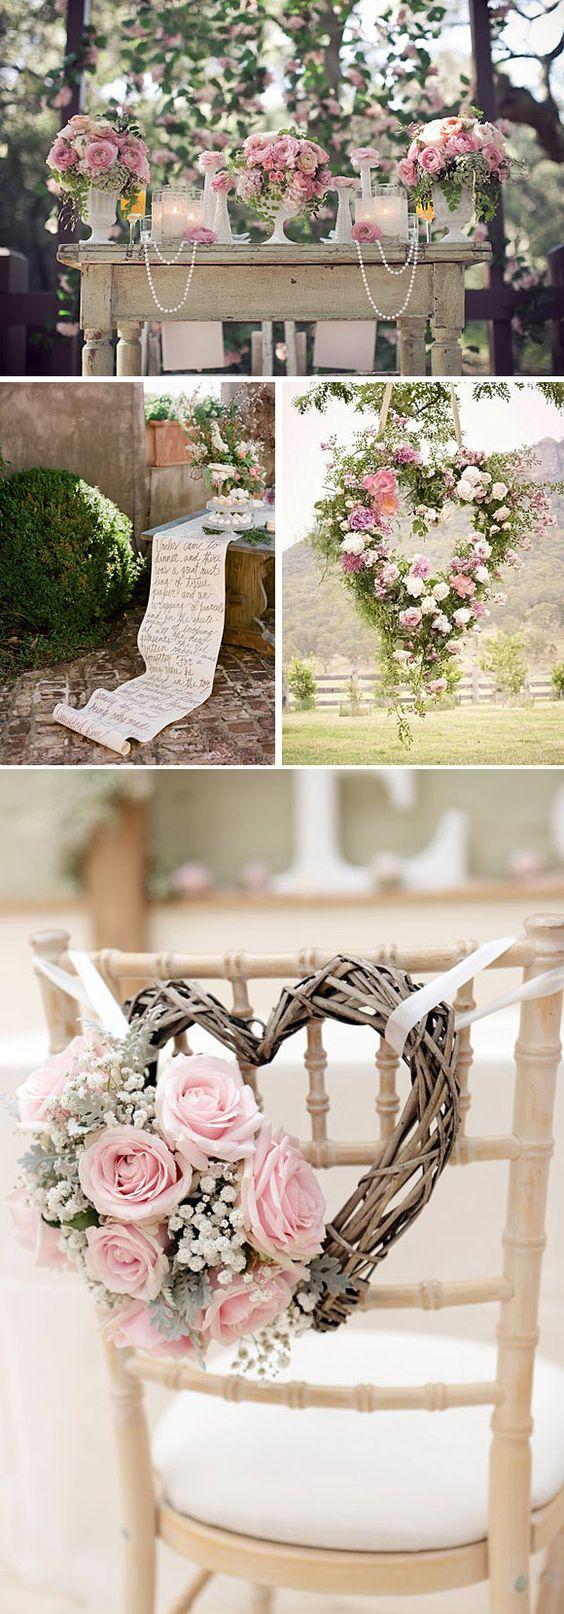 casa-da-cris-casamento-rustico-varias